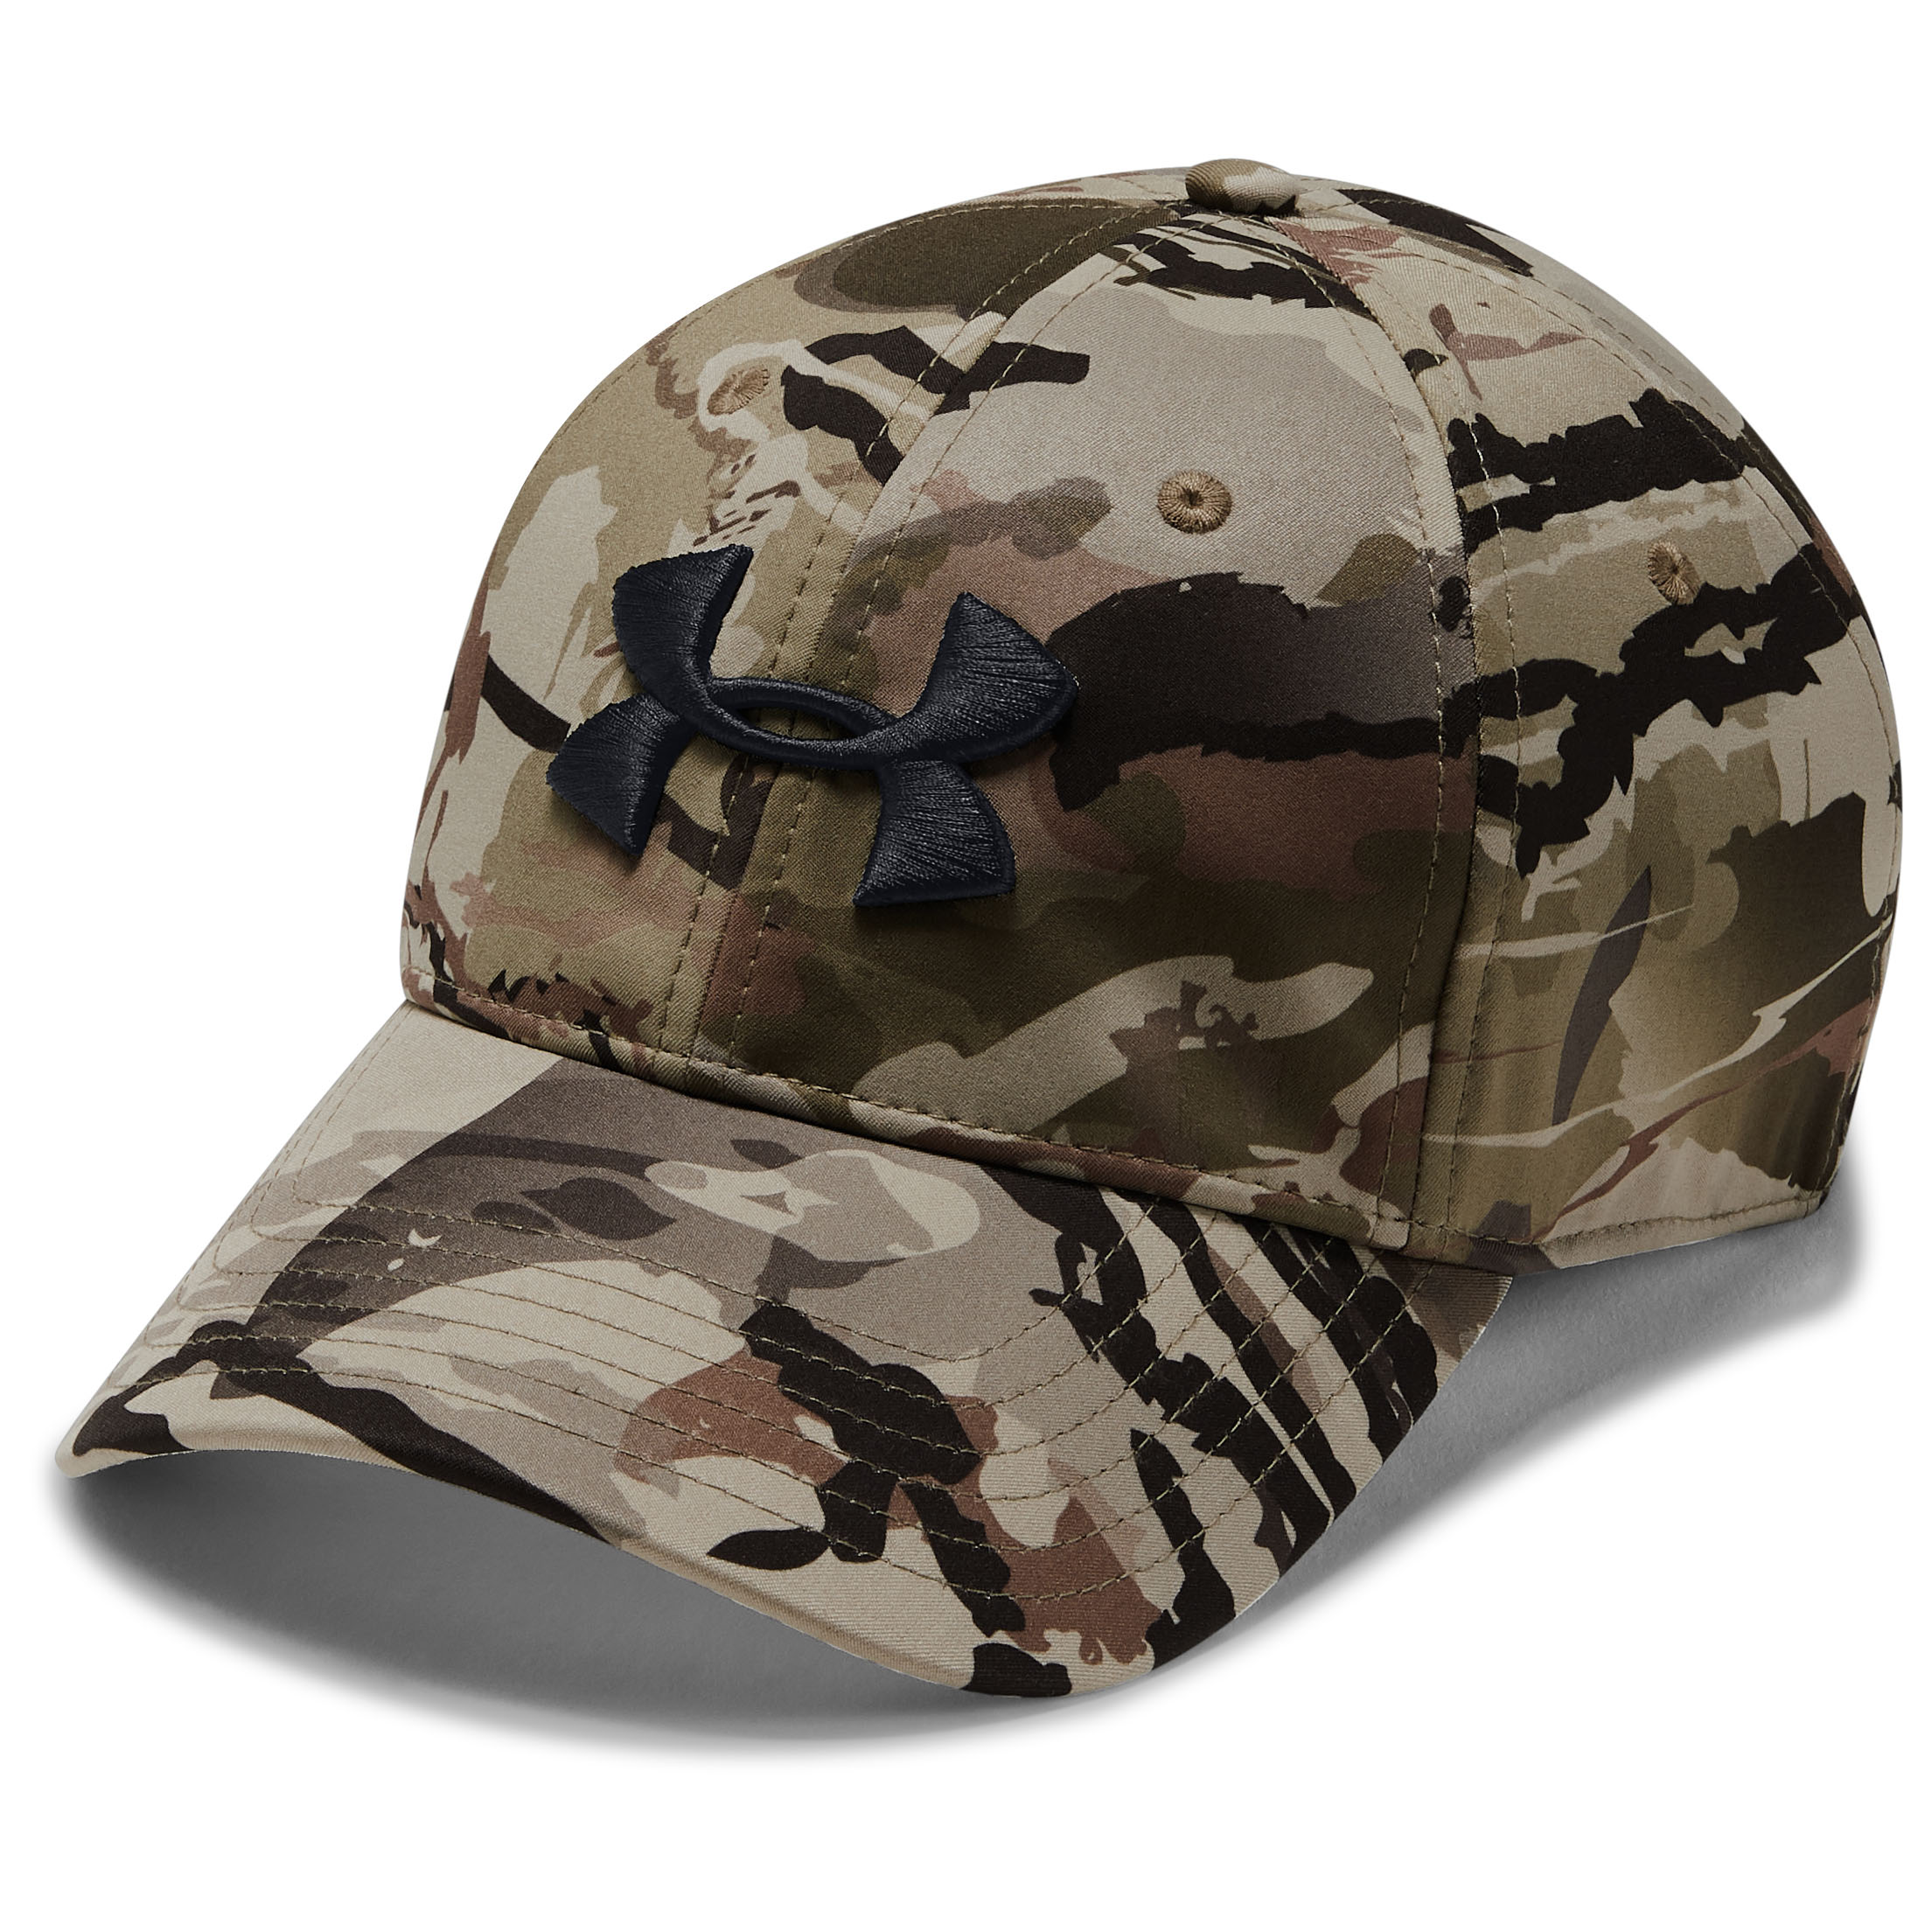 Under Armour - Men's UA Camo Stretch Fit Hunting Cap